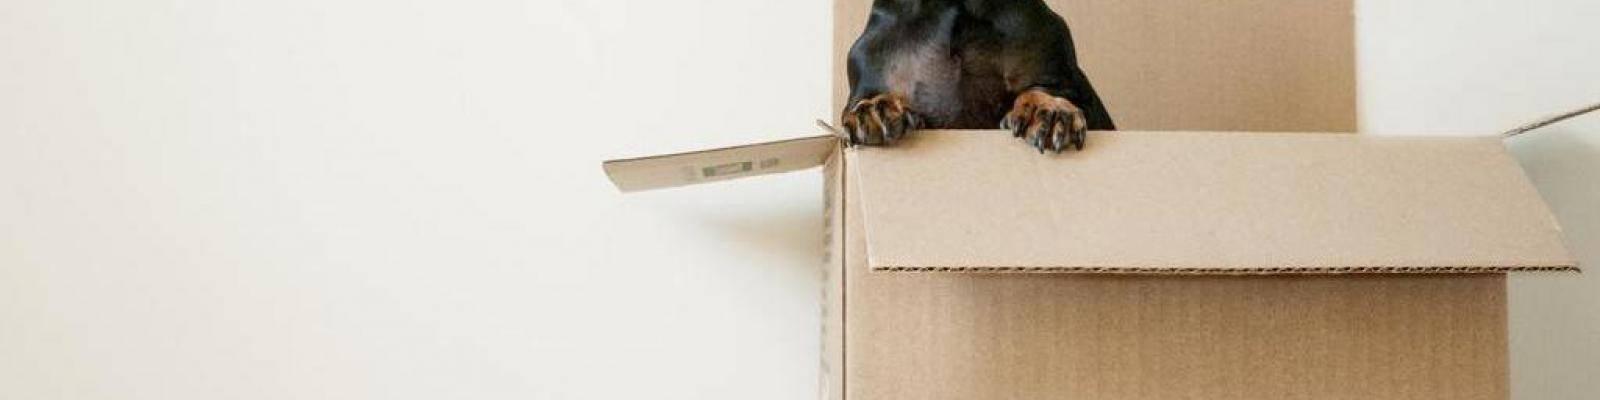 Hond in verhuisdoos